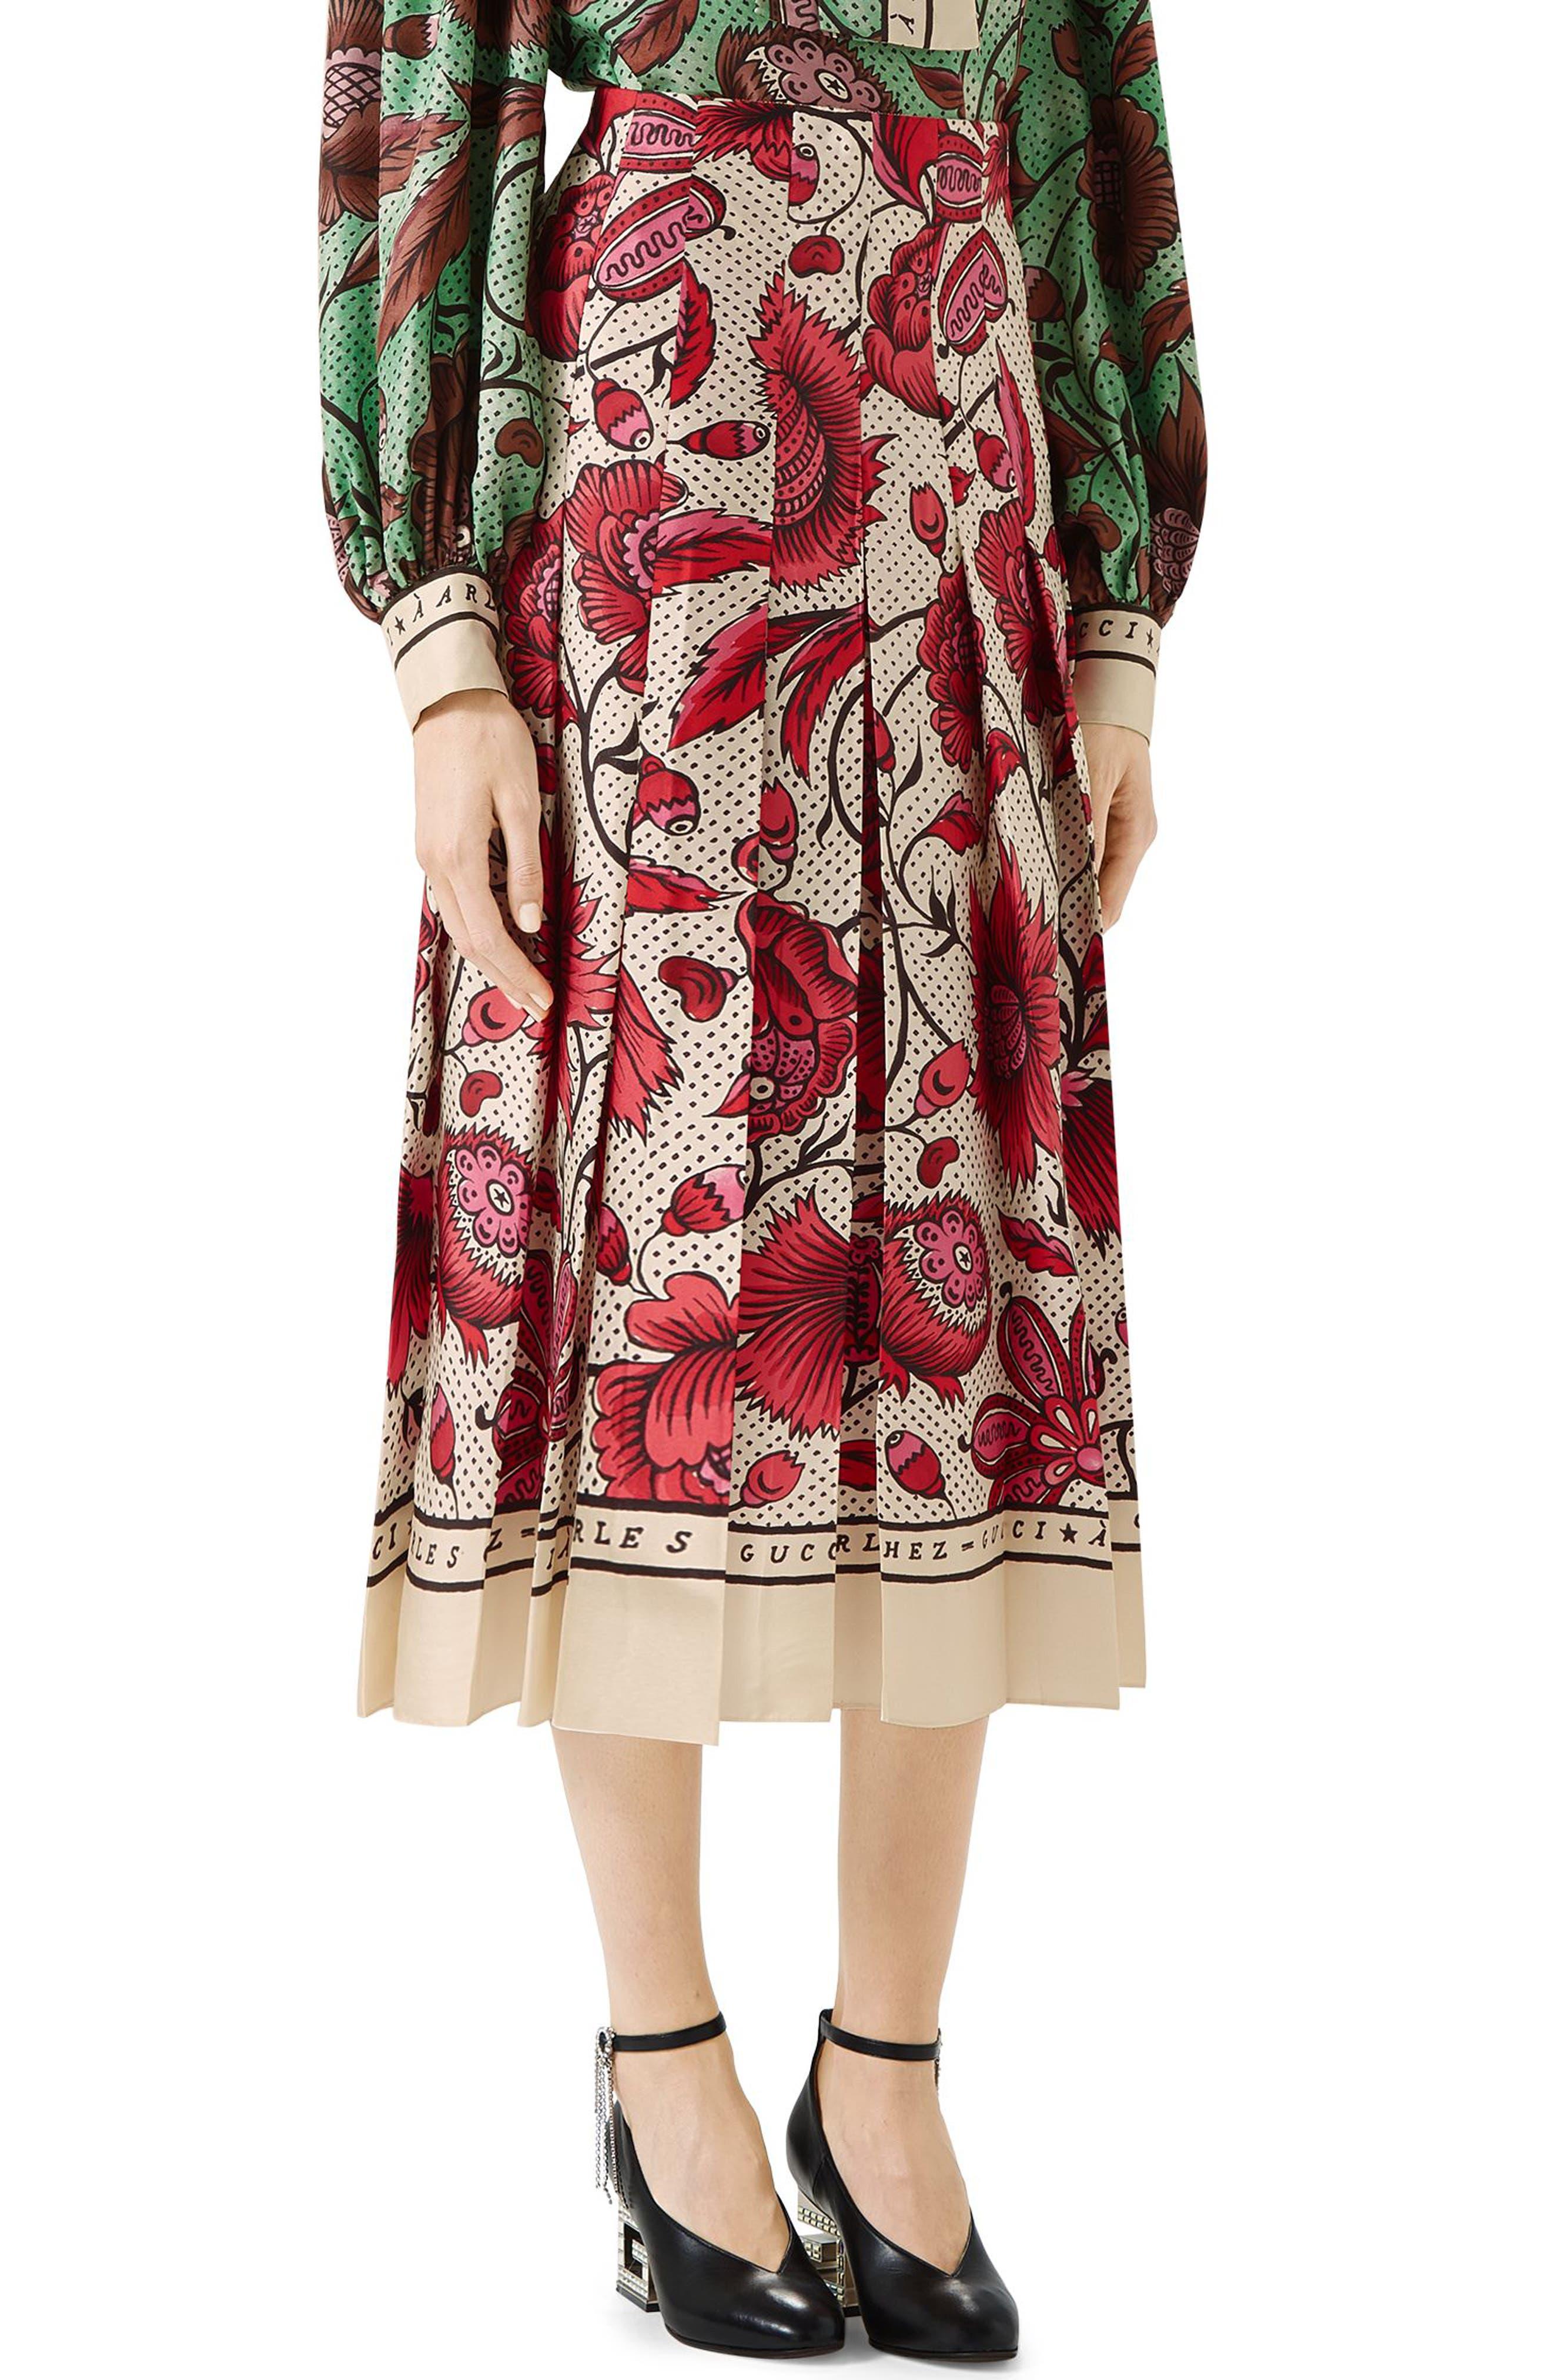 Watercolor Floral Print Pleated Silk Twill Midi Skirt,                             Main thumbnail 1, color,                             5349 FUCHSIA/ IVORY PRINTE